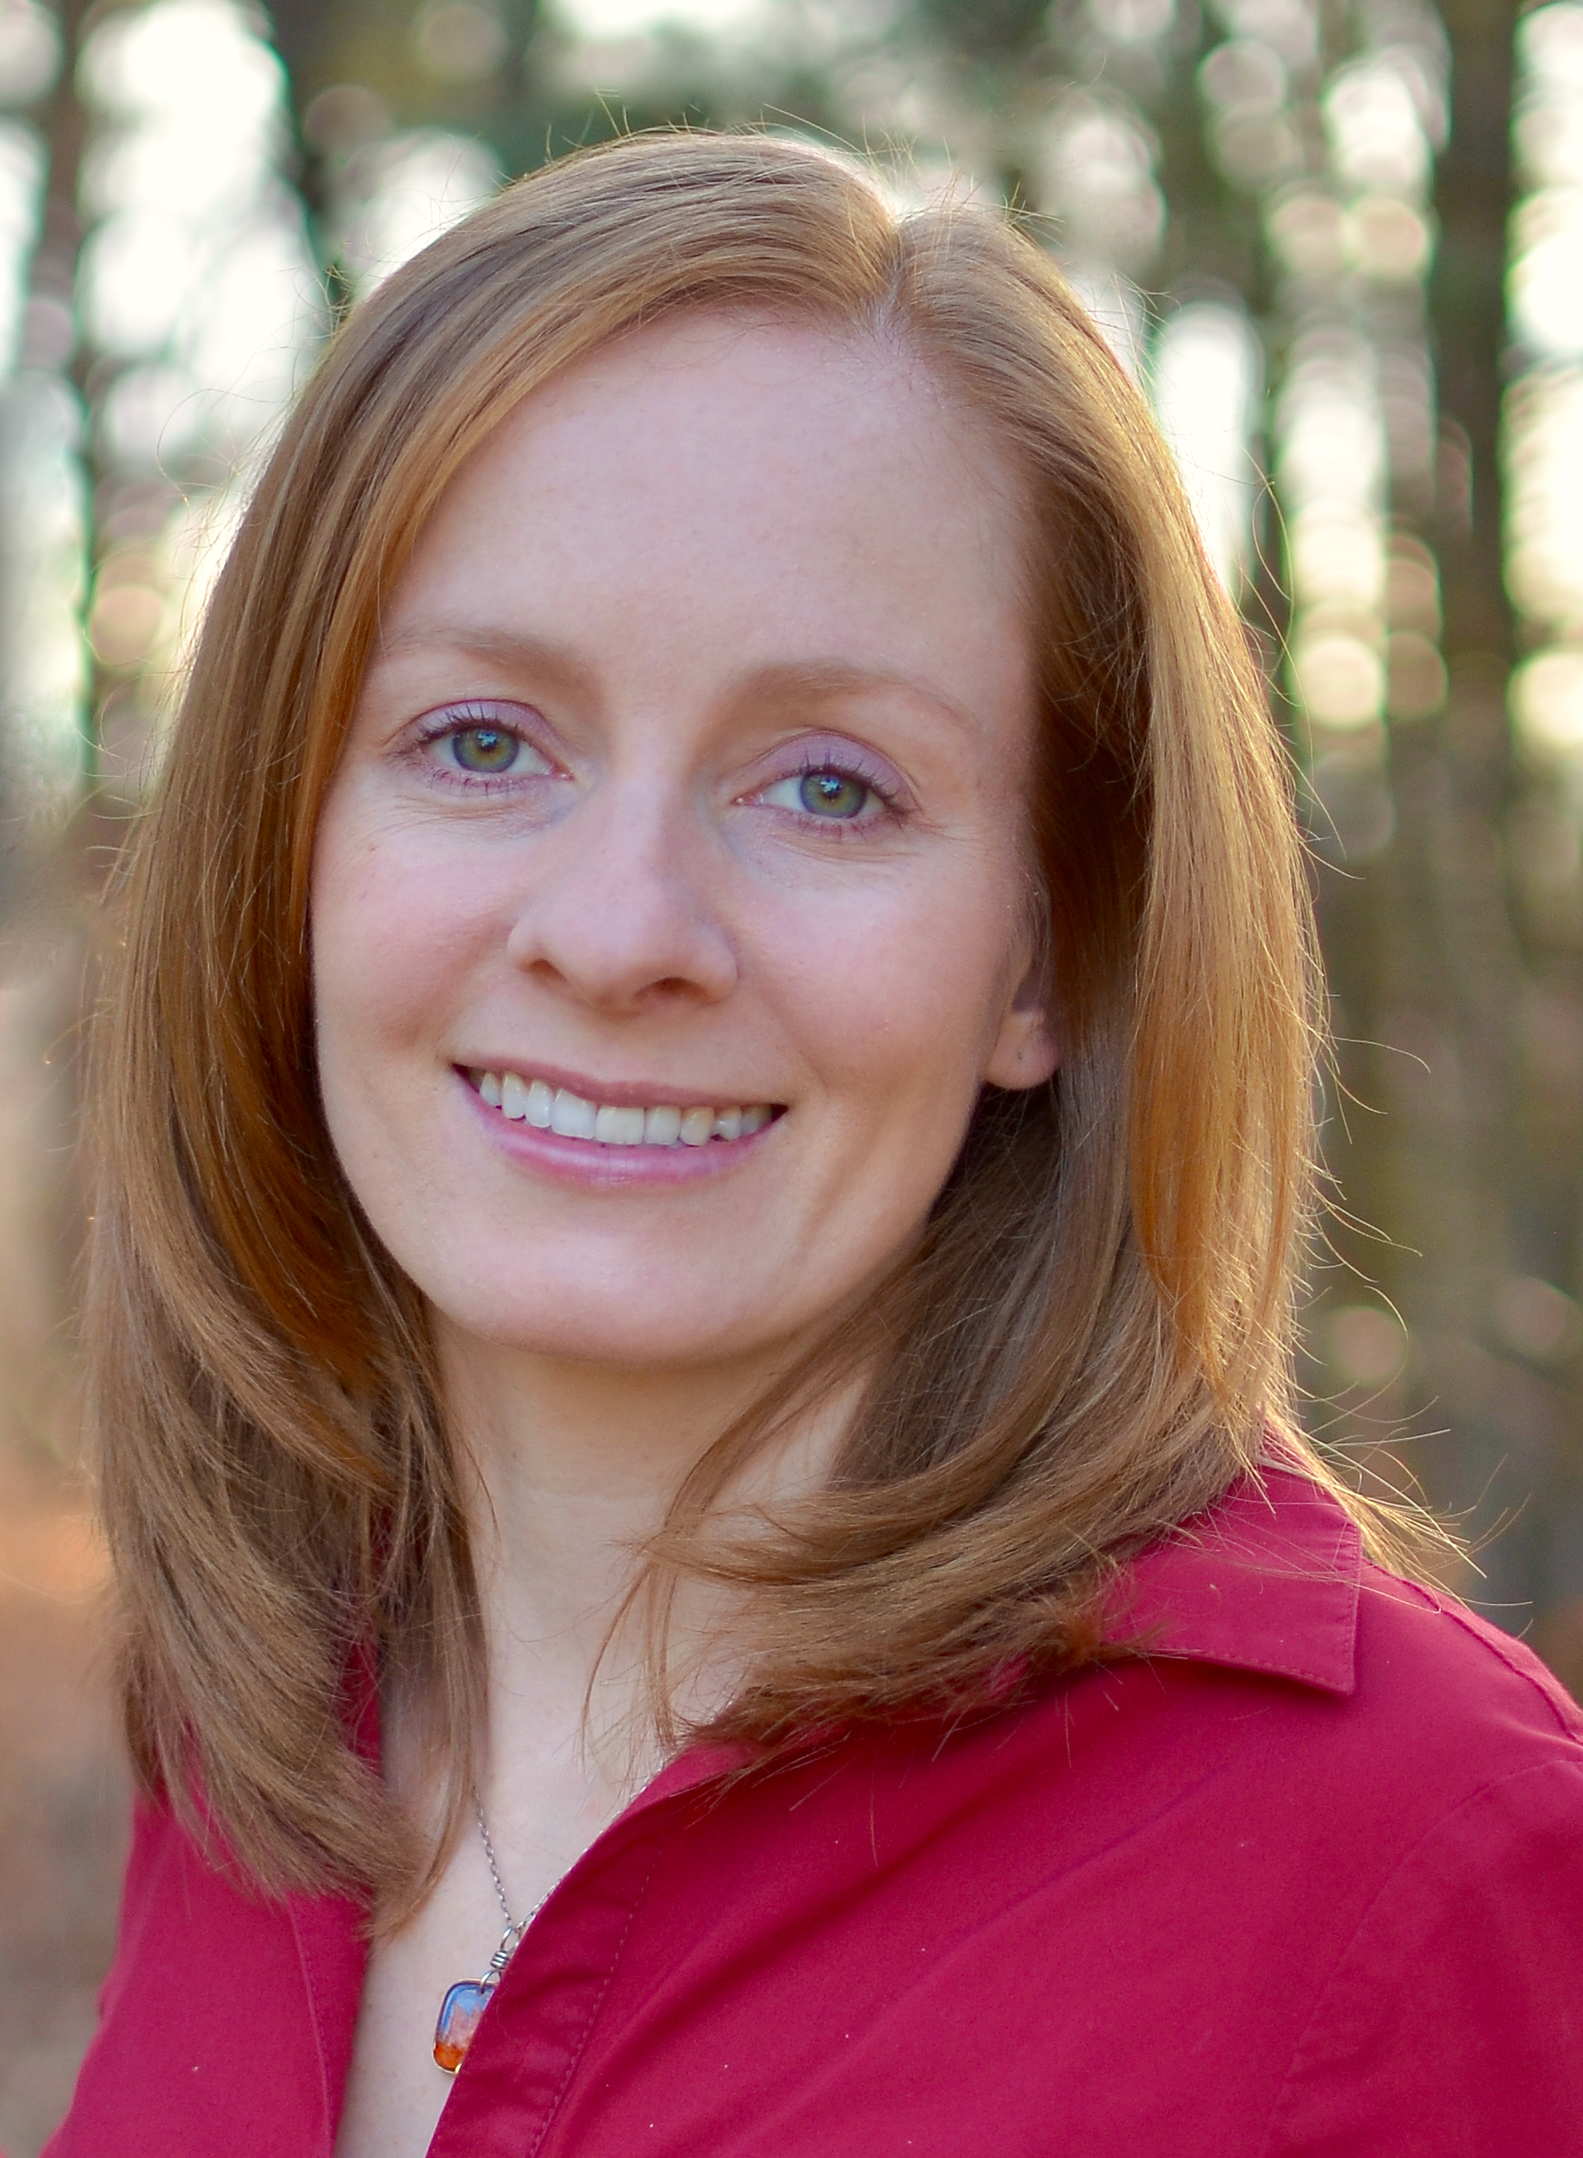 Lena Moser, Co-Founder of MYBC